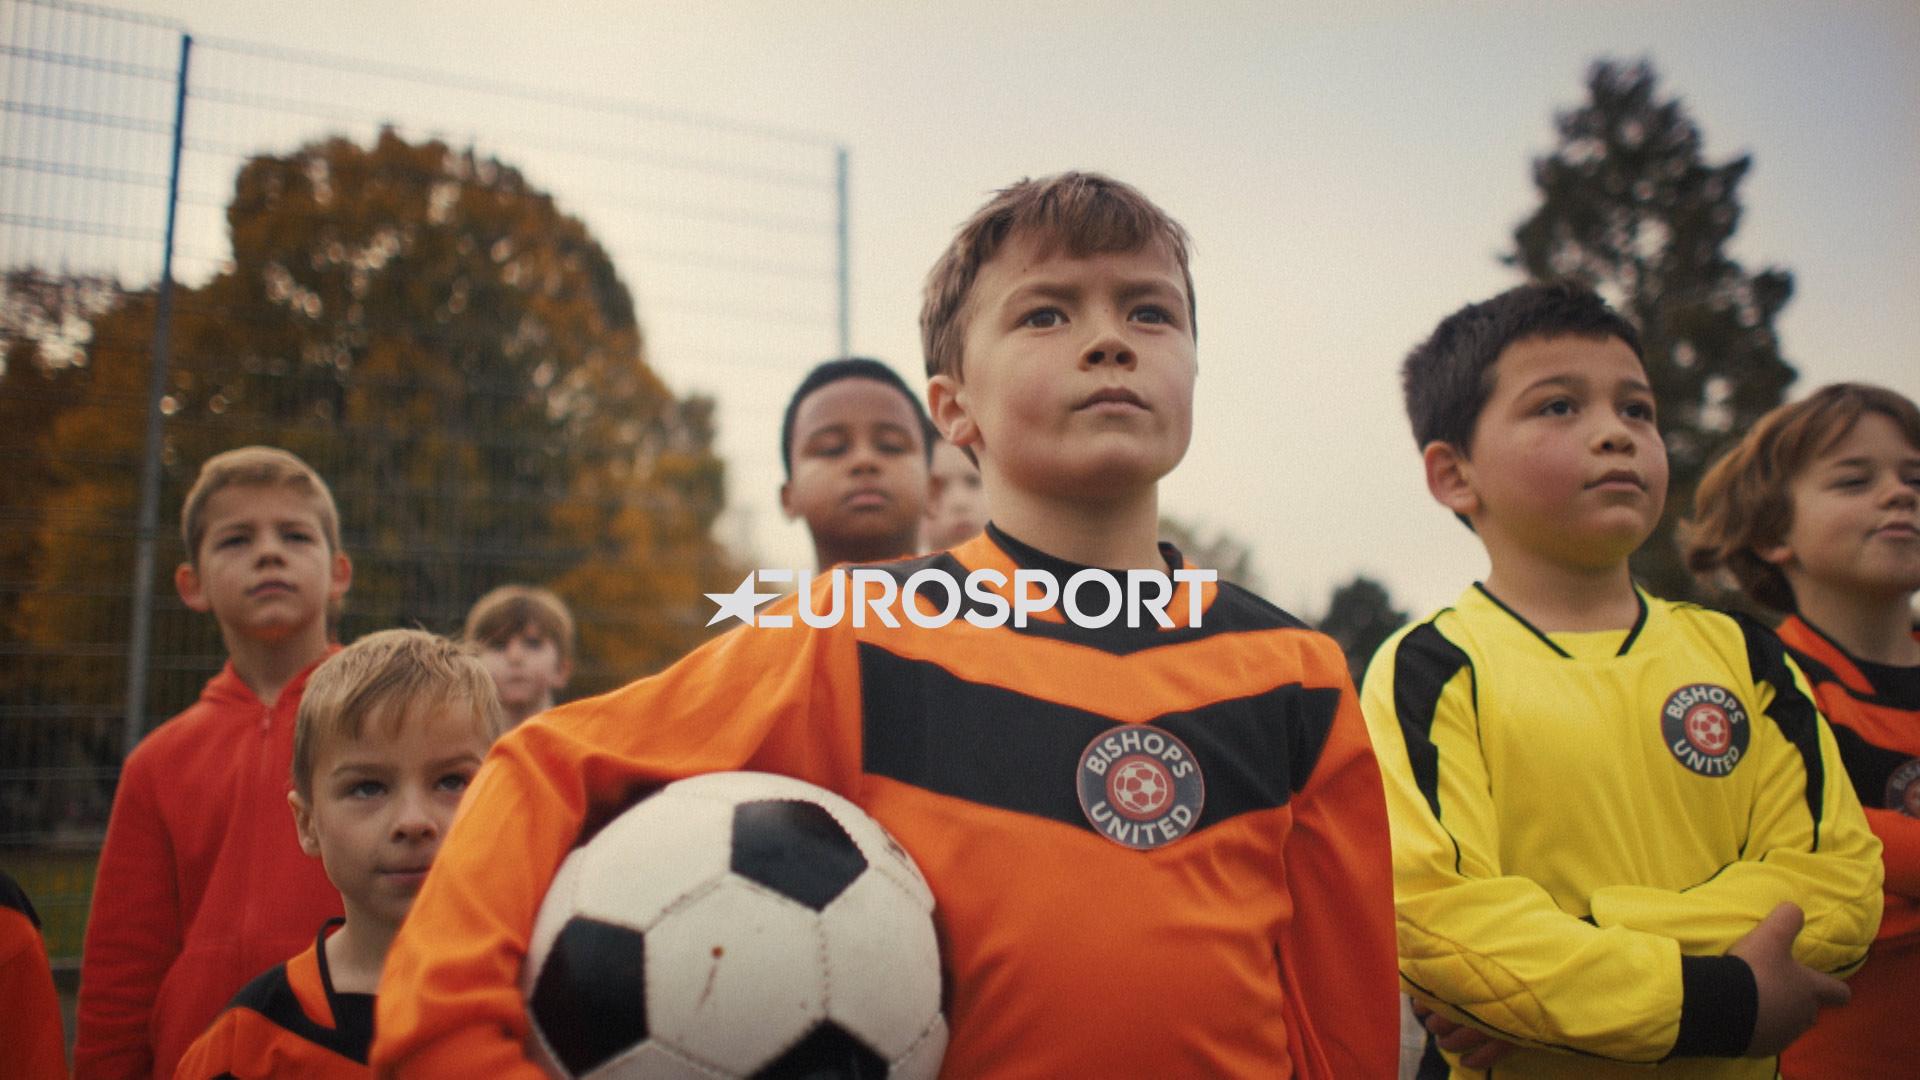 Bestes Corporate Designpaket: Eurosport Branding